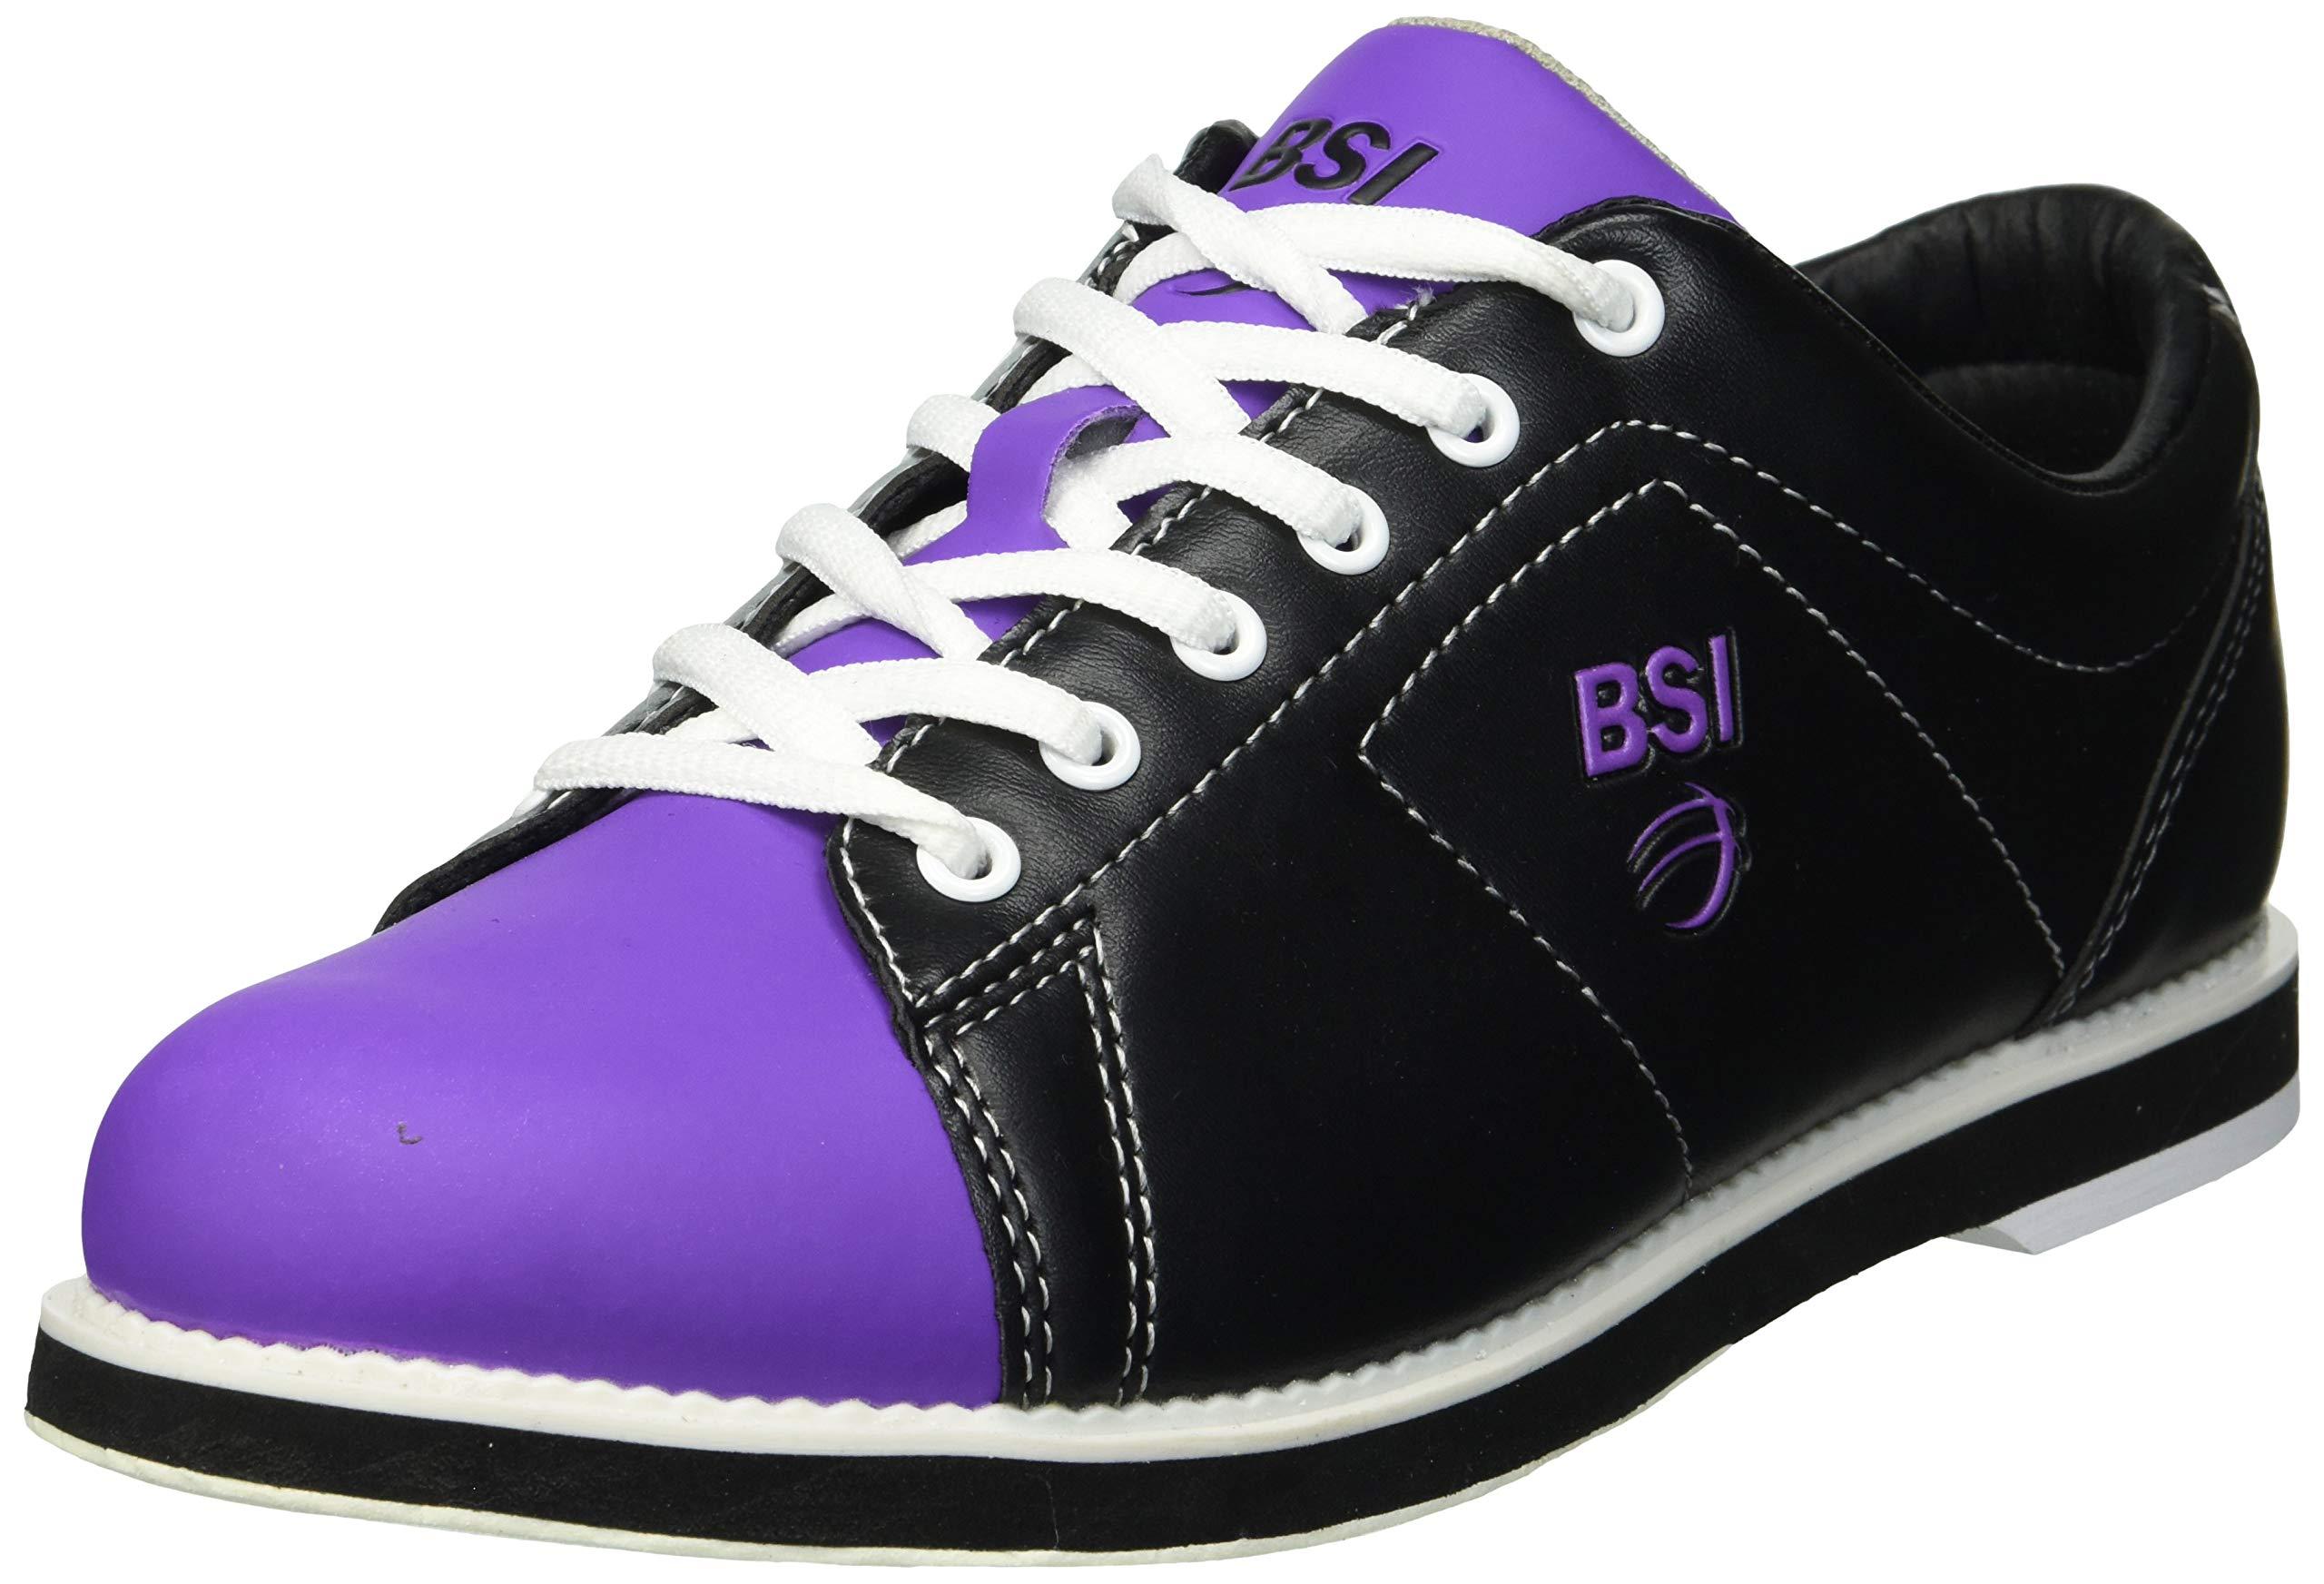 BSI 654 Women's Classic #654, Black/Purple, 7.0 by BSI (Image #1)